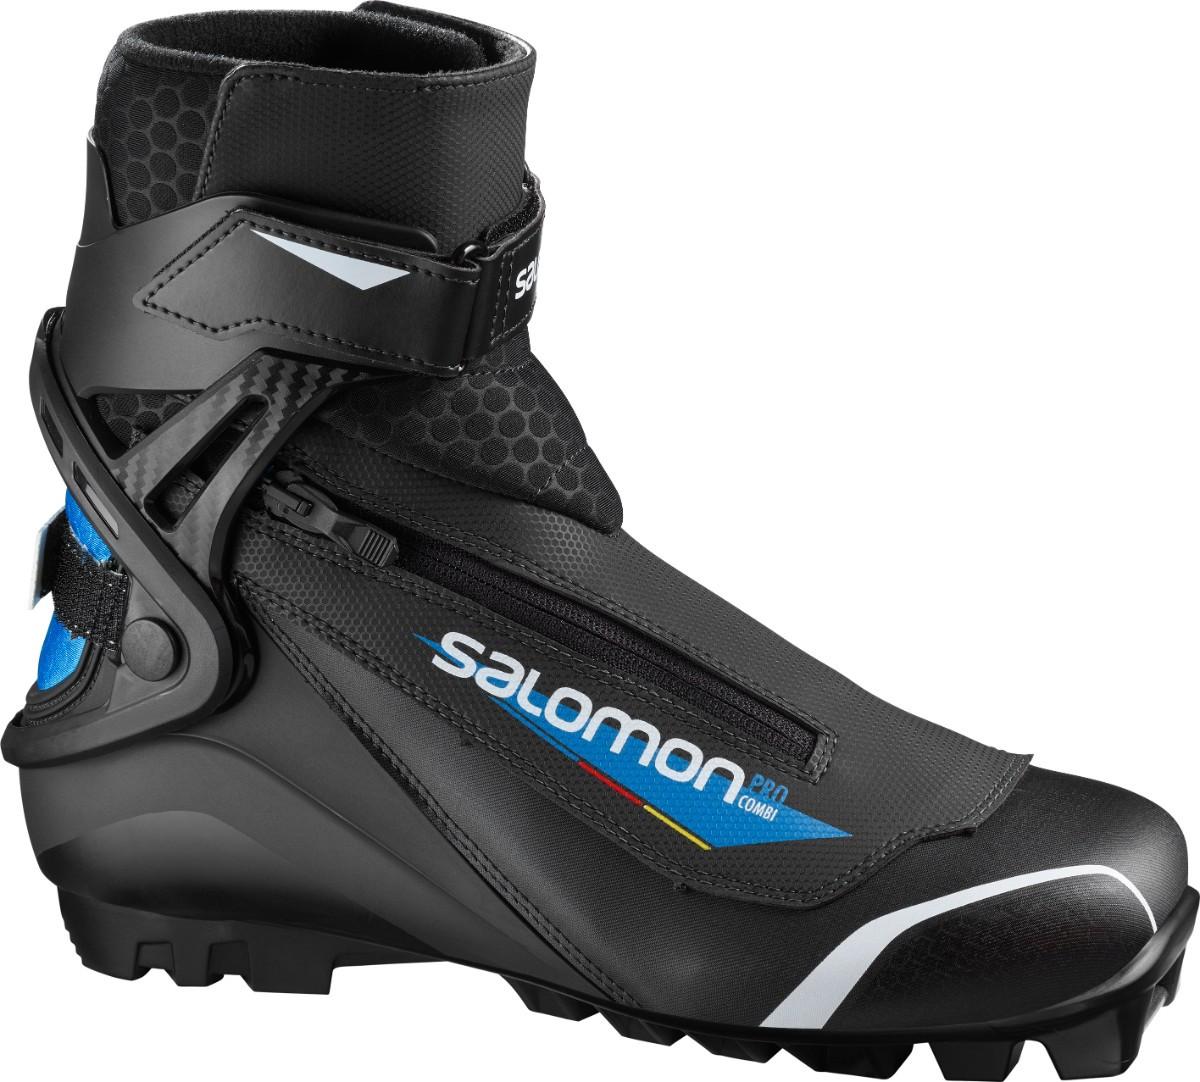 Salomon Pro Combi Pilot 2020/2021